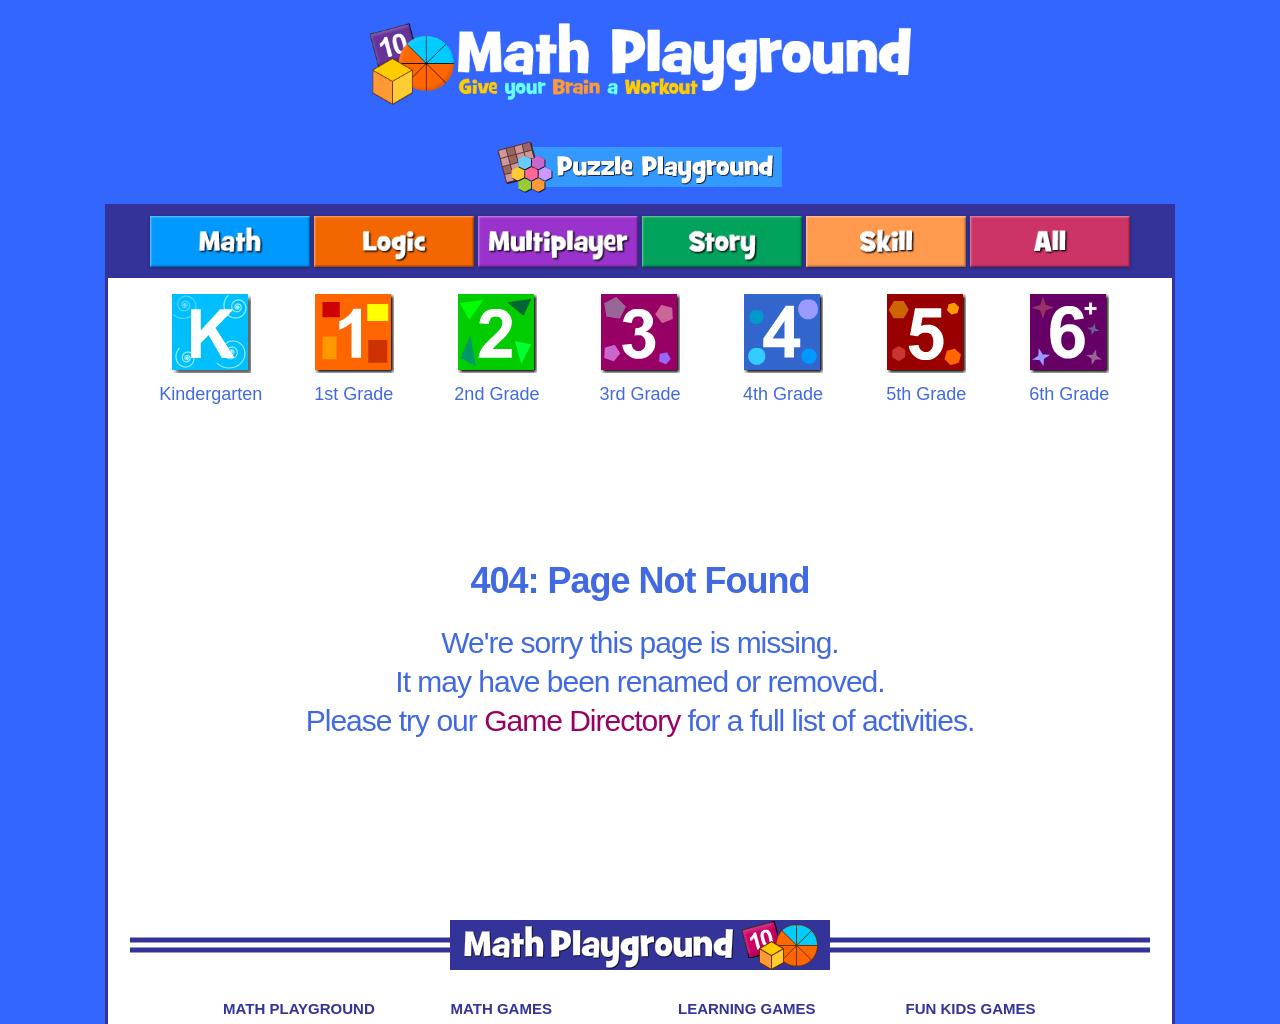 Maths Playground